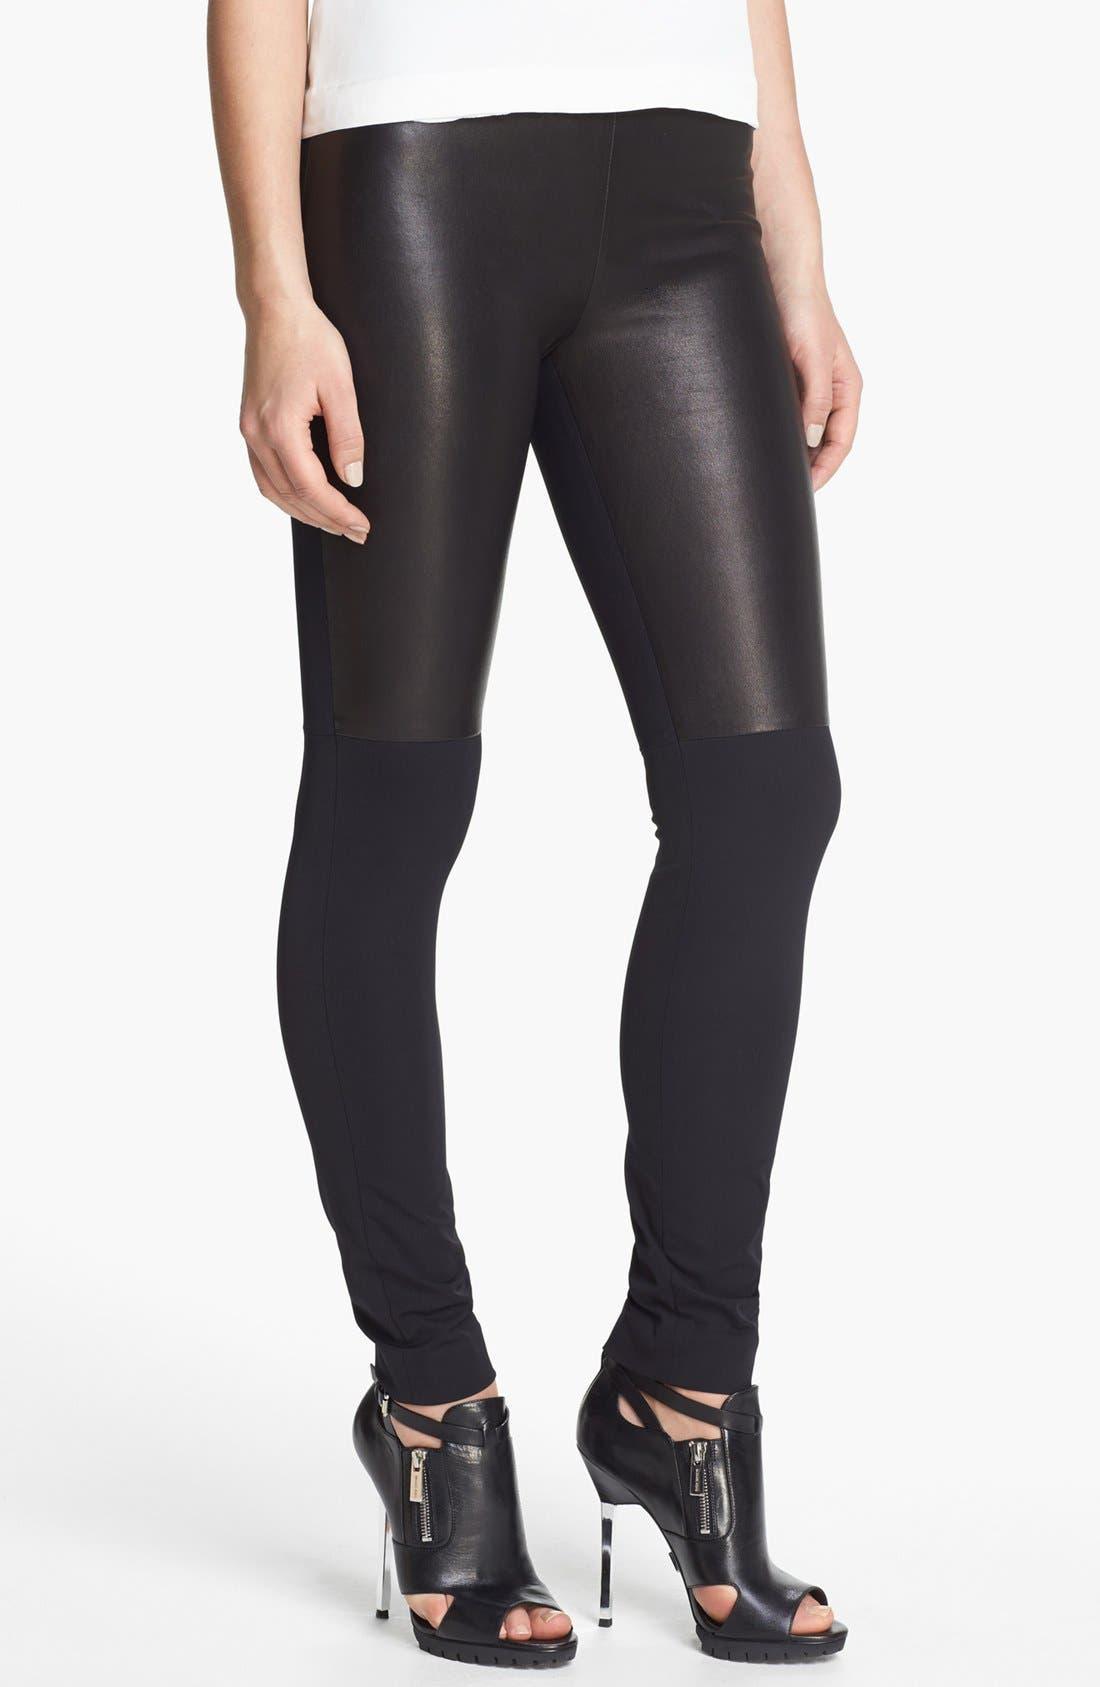 Alternate Image 1 Selected - Milly 'Bri' Leather Panel Leggings